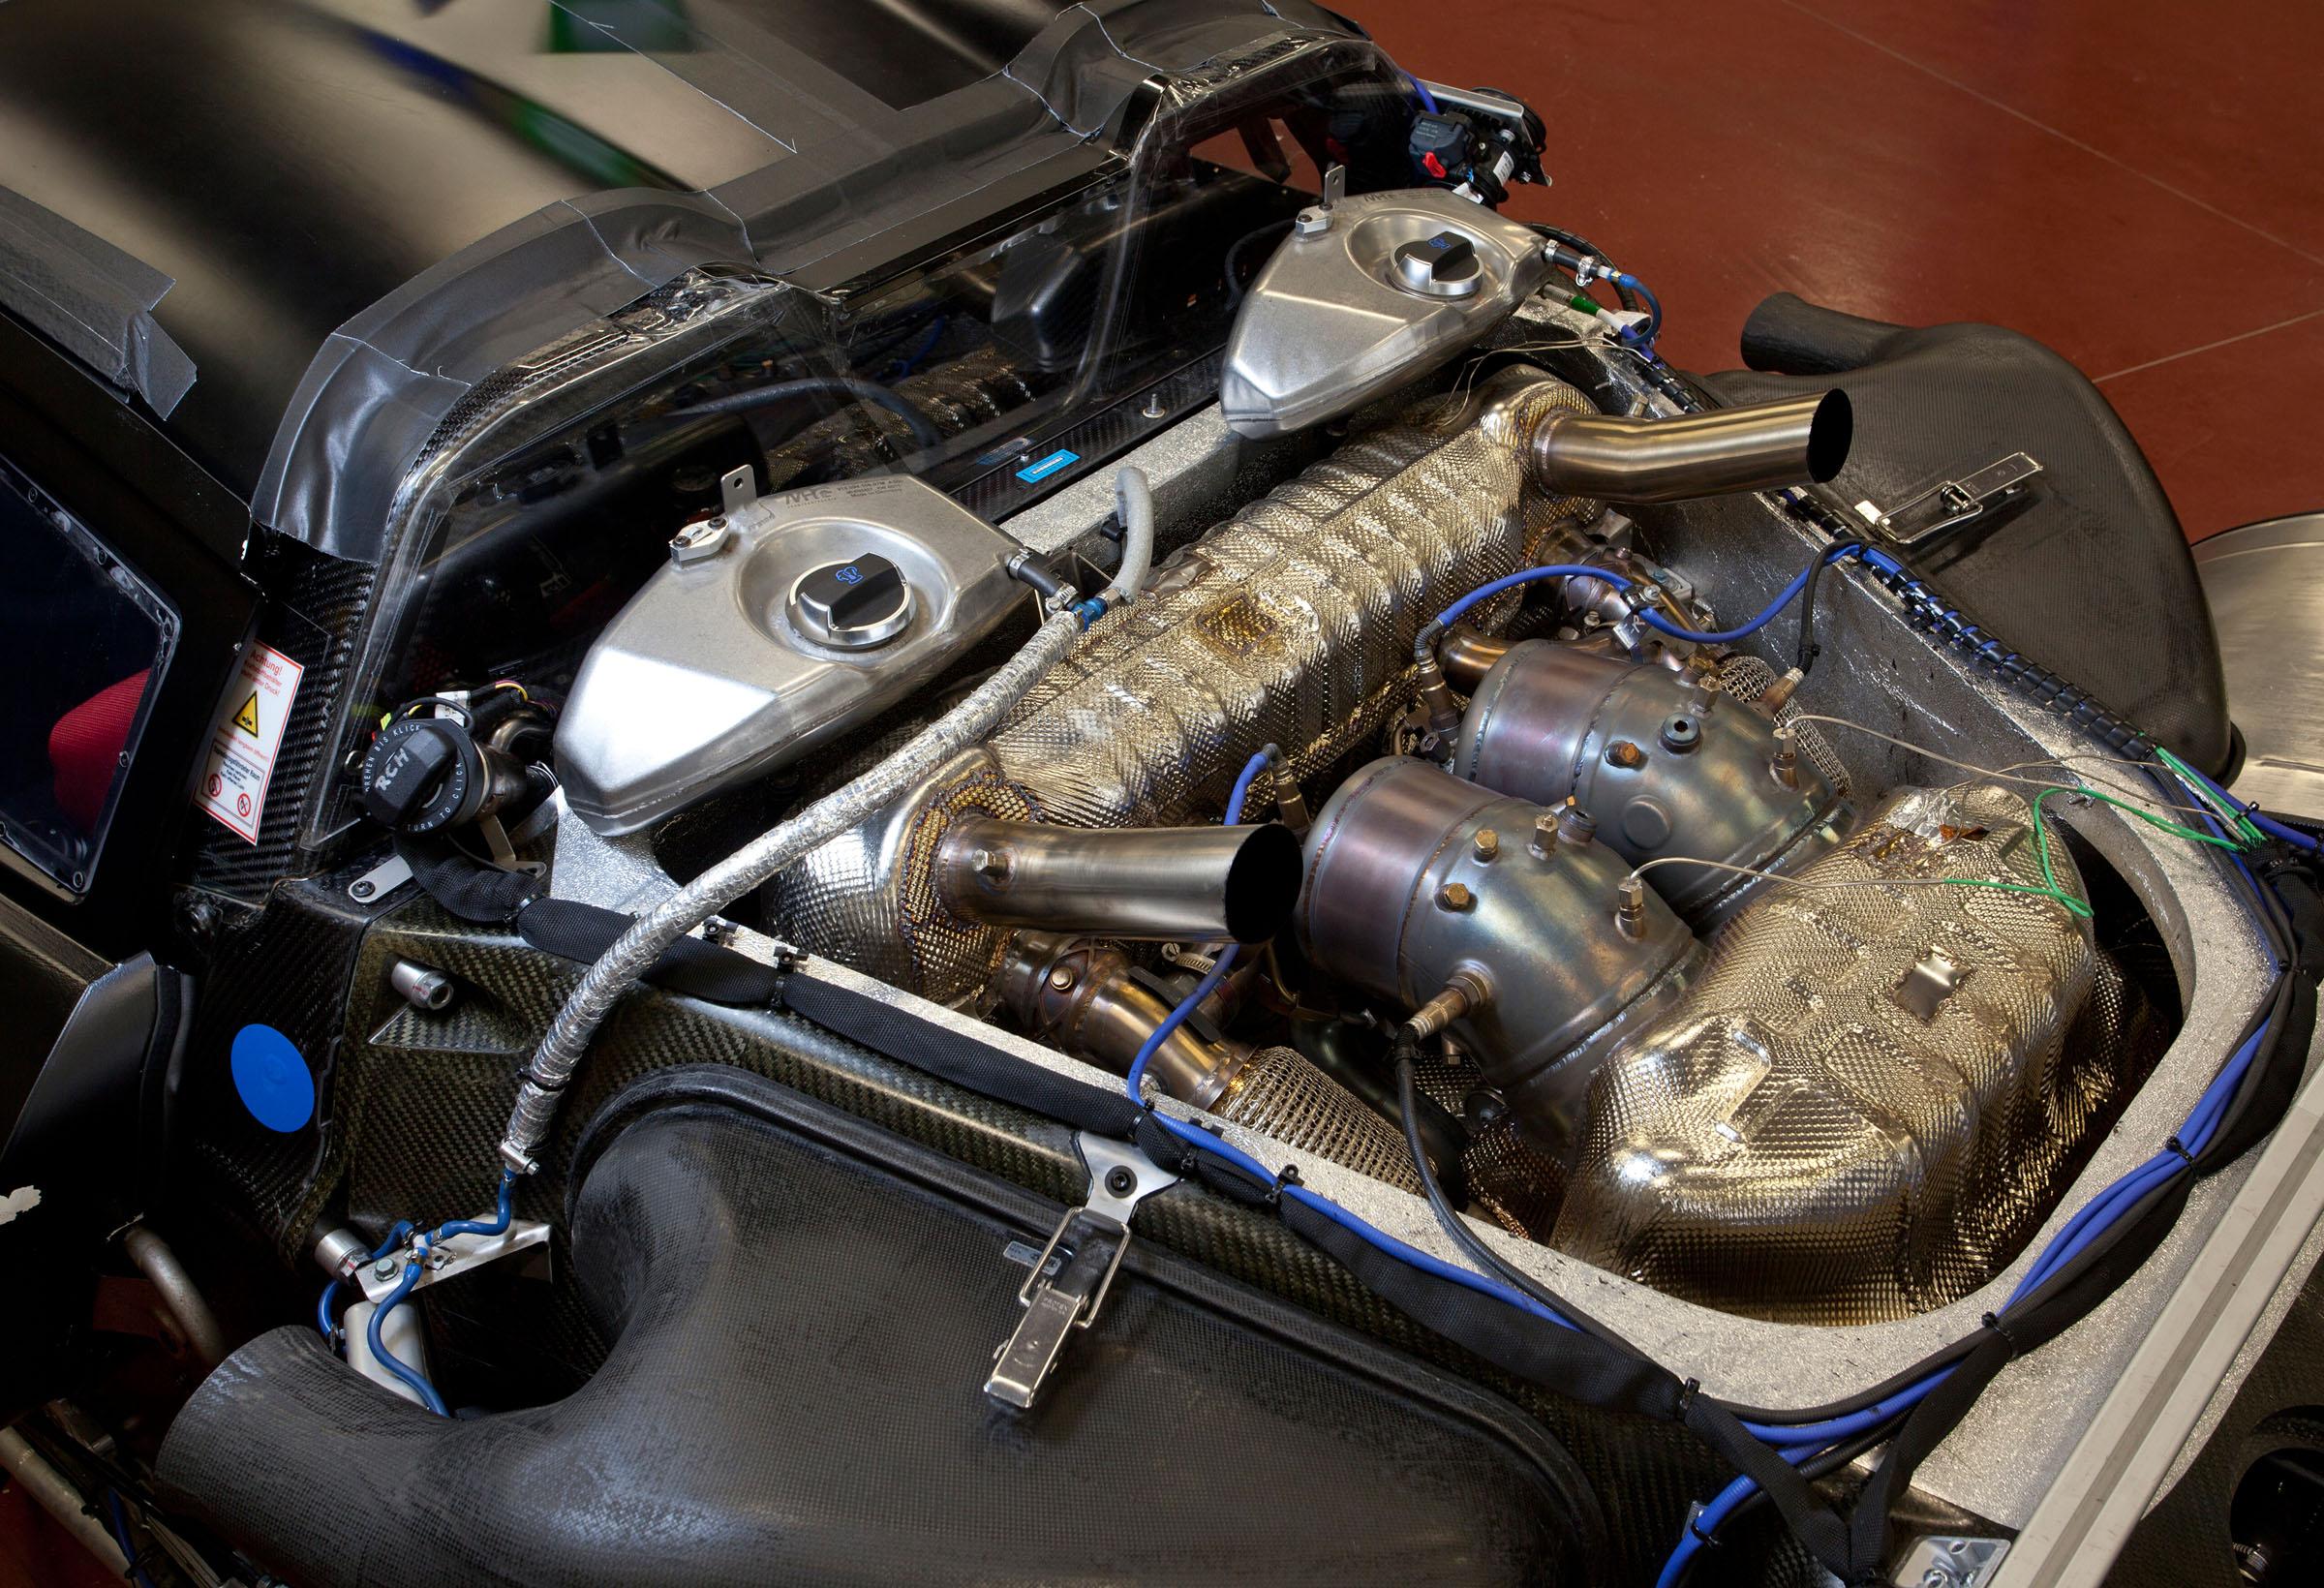 A view of a Porsche MR6 V8 Hybrid engine